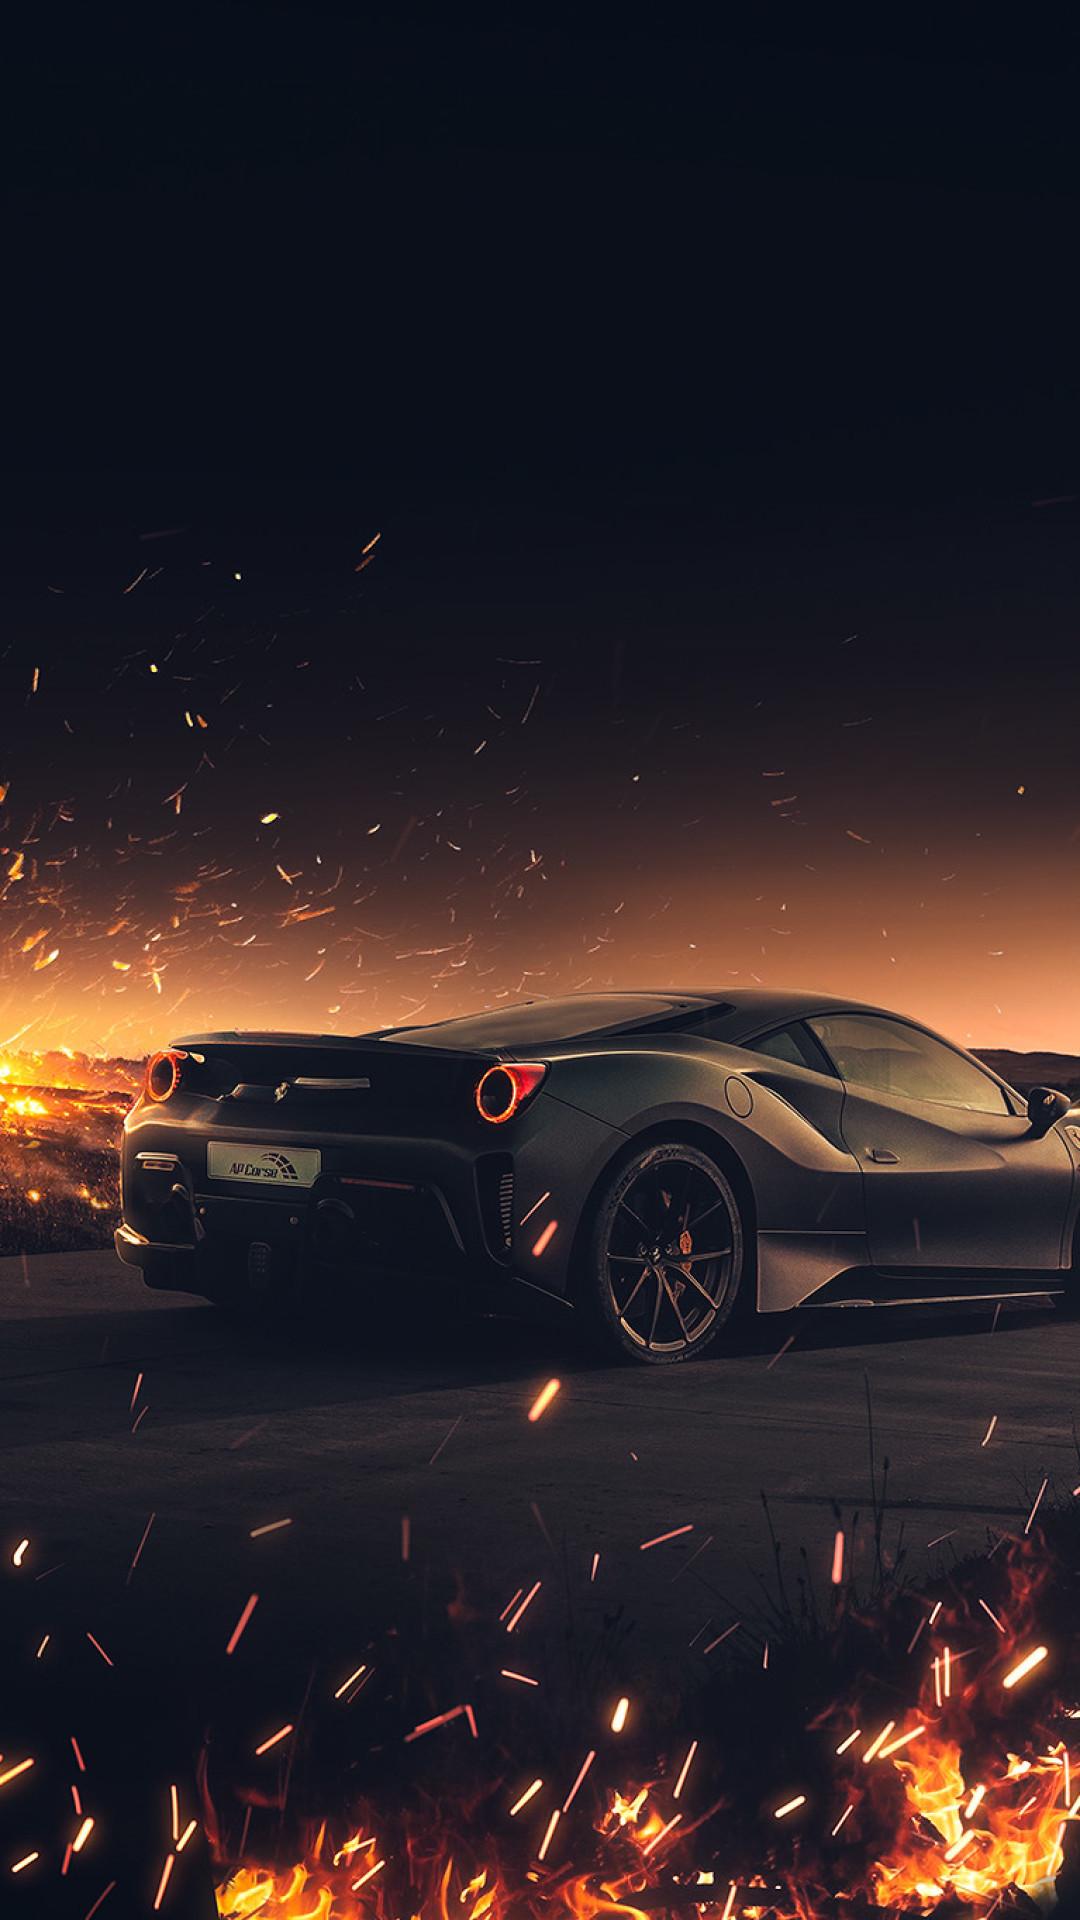 Ferrari 488 Ferrari Cars Hd Behance Images Hd Ferrari Pista Wallpaper Iphone 3008686 Hd Wallpaper Backgrounds Download